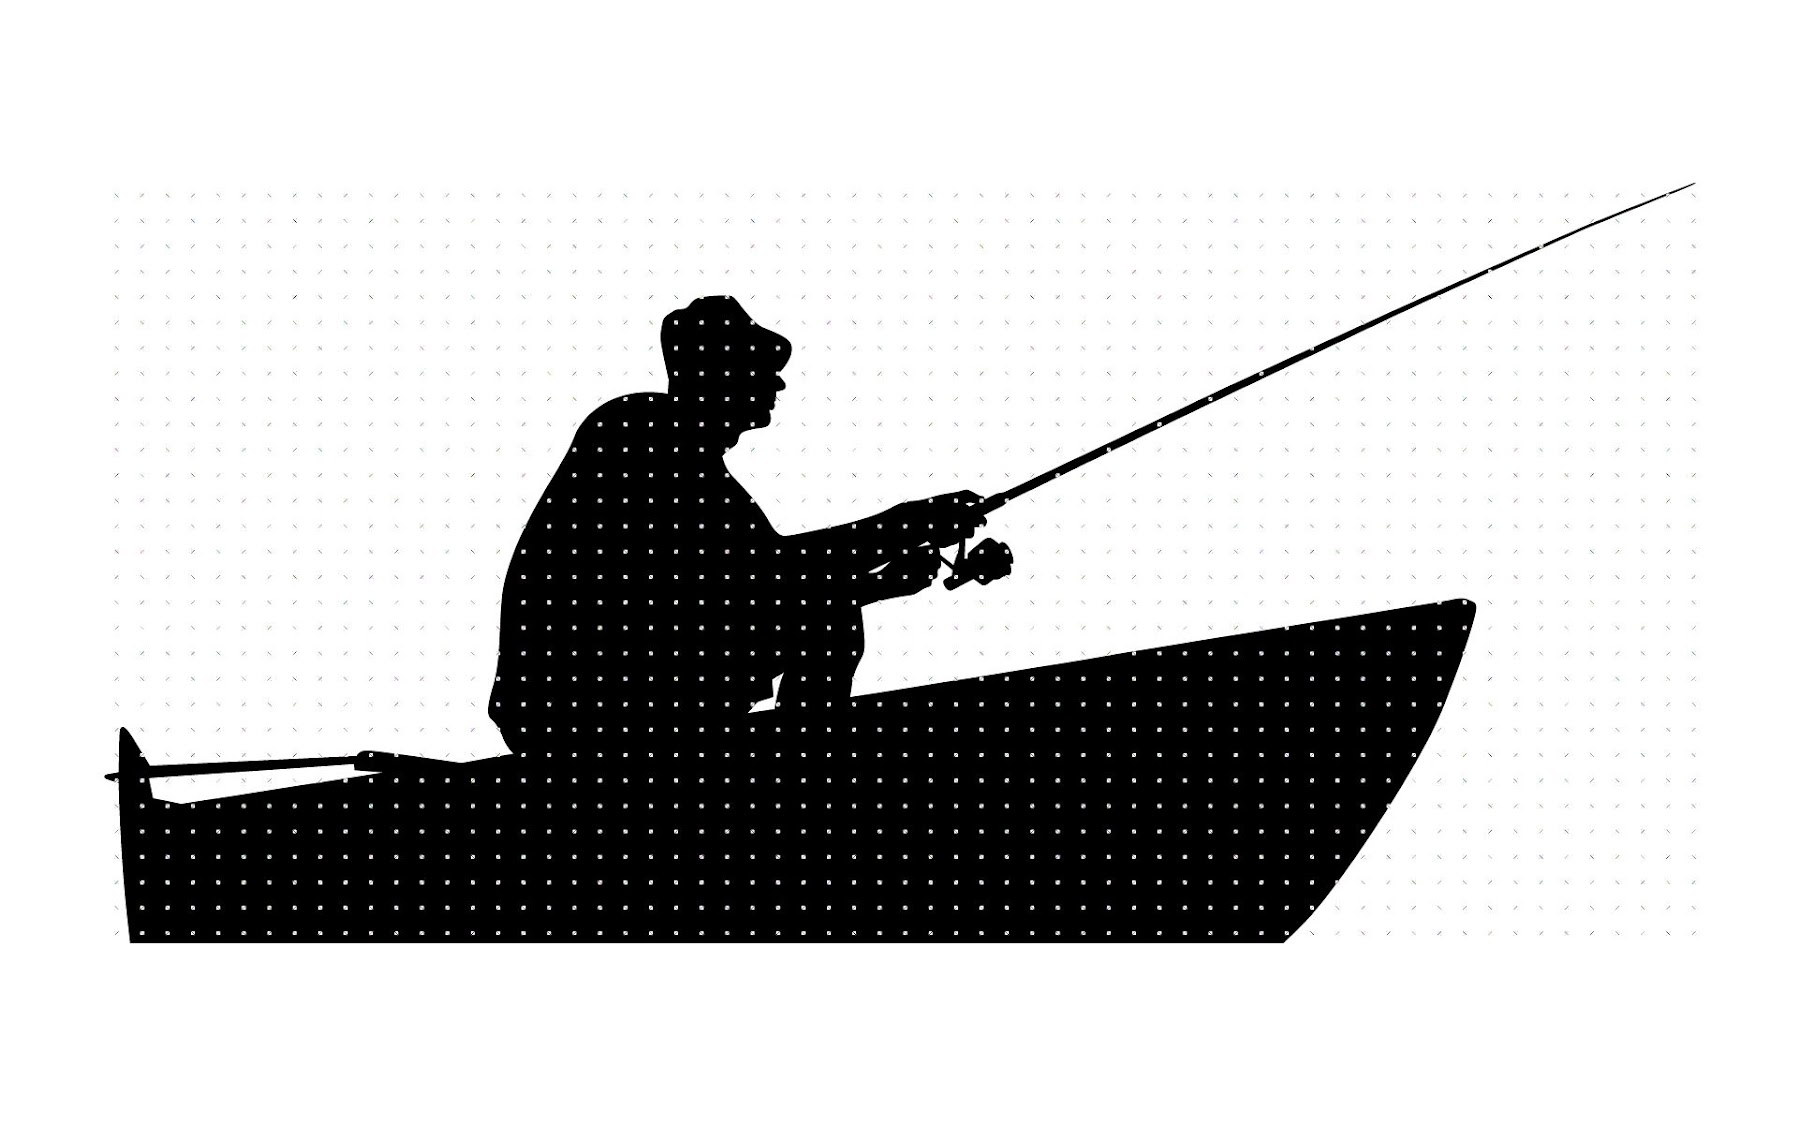 Download Fishing Reel Svg Fishing Cut File Clipart Eps Png Fisherman Svg Fishing Tackle Png Fishing Line Svg Fishing Svg Fishing Rod Svg Drawing Illustration Digital Tripod Ee